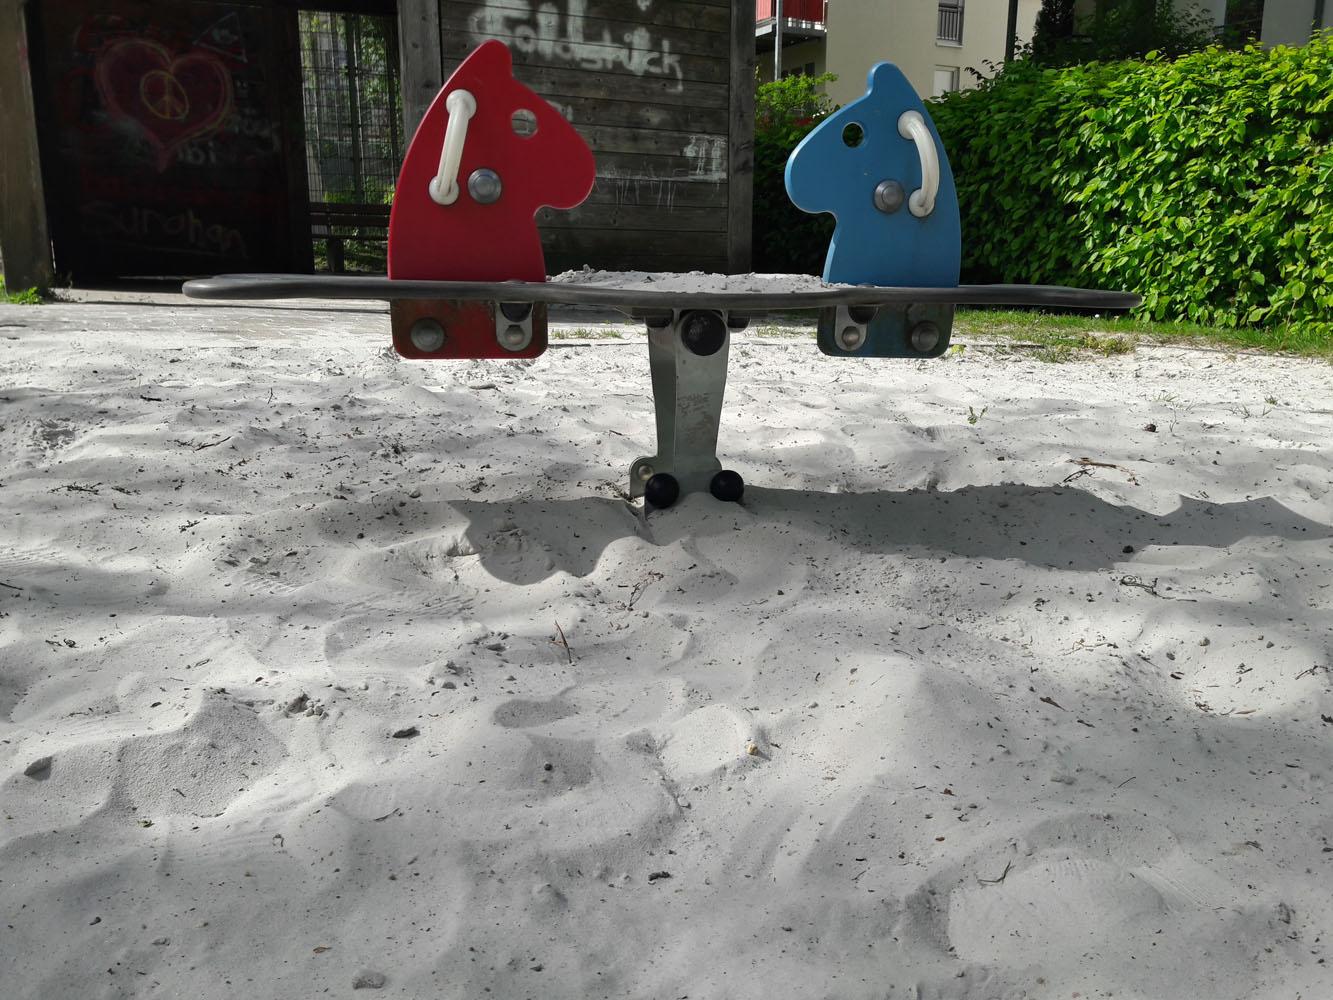 spielplatz_habsburgerallee_aachen